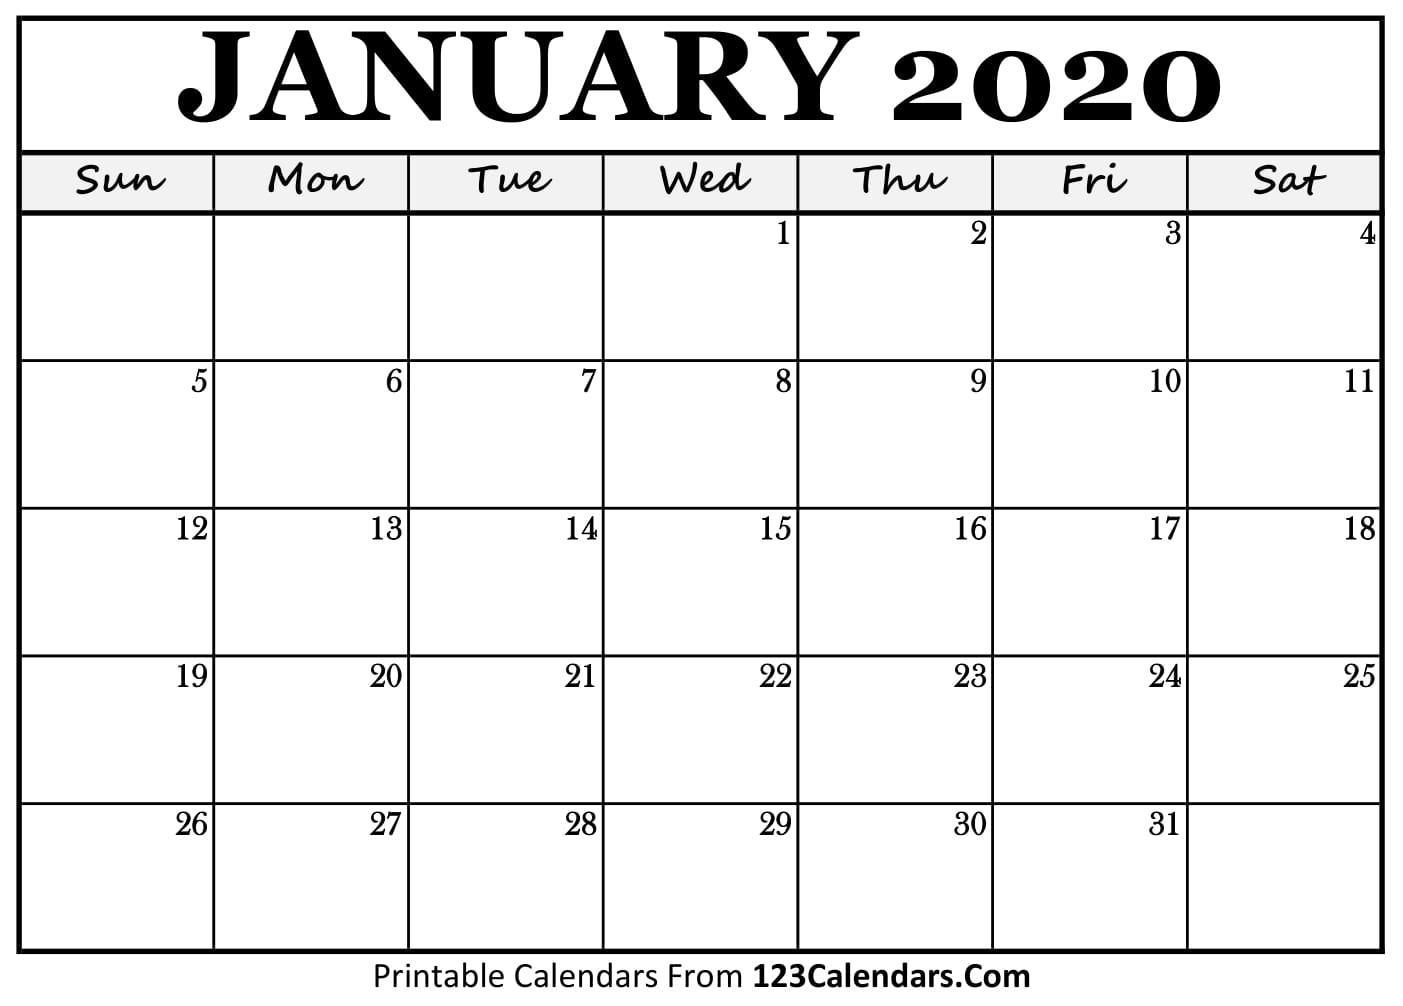 013 Template Ideas Blank Printable Striking Calendar 2020